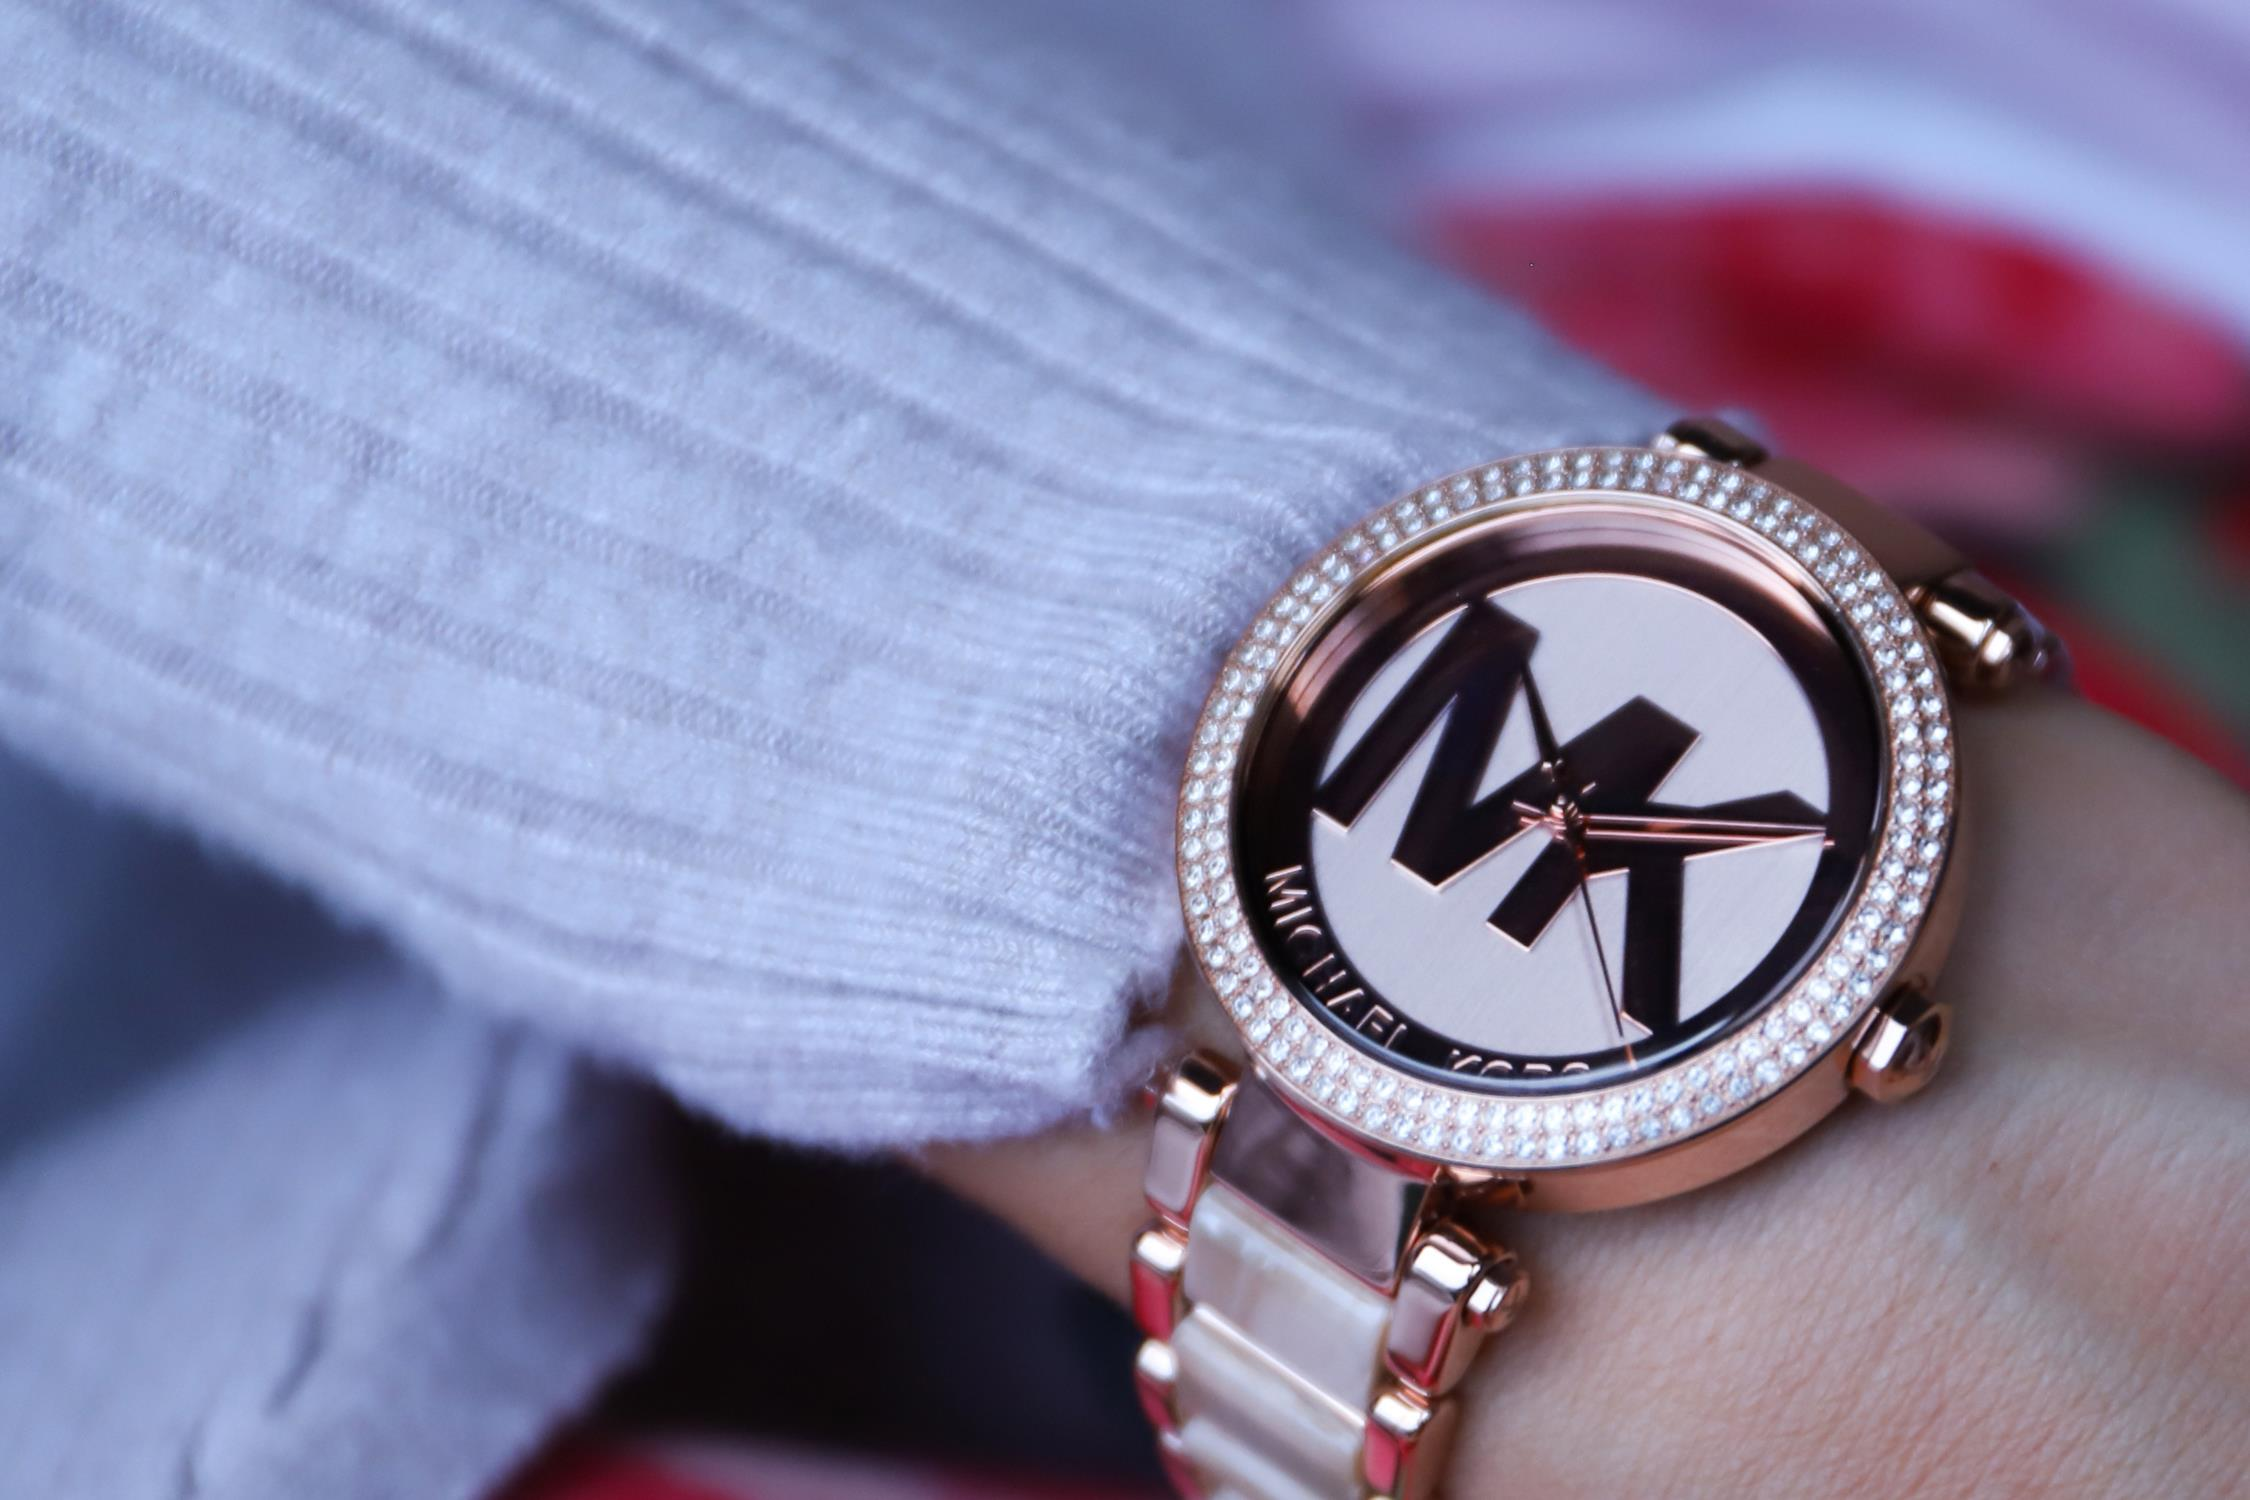 zegarek Michael Kors MK6530 różowe złoto Parker